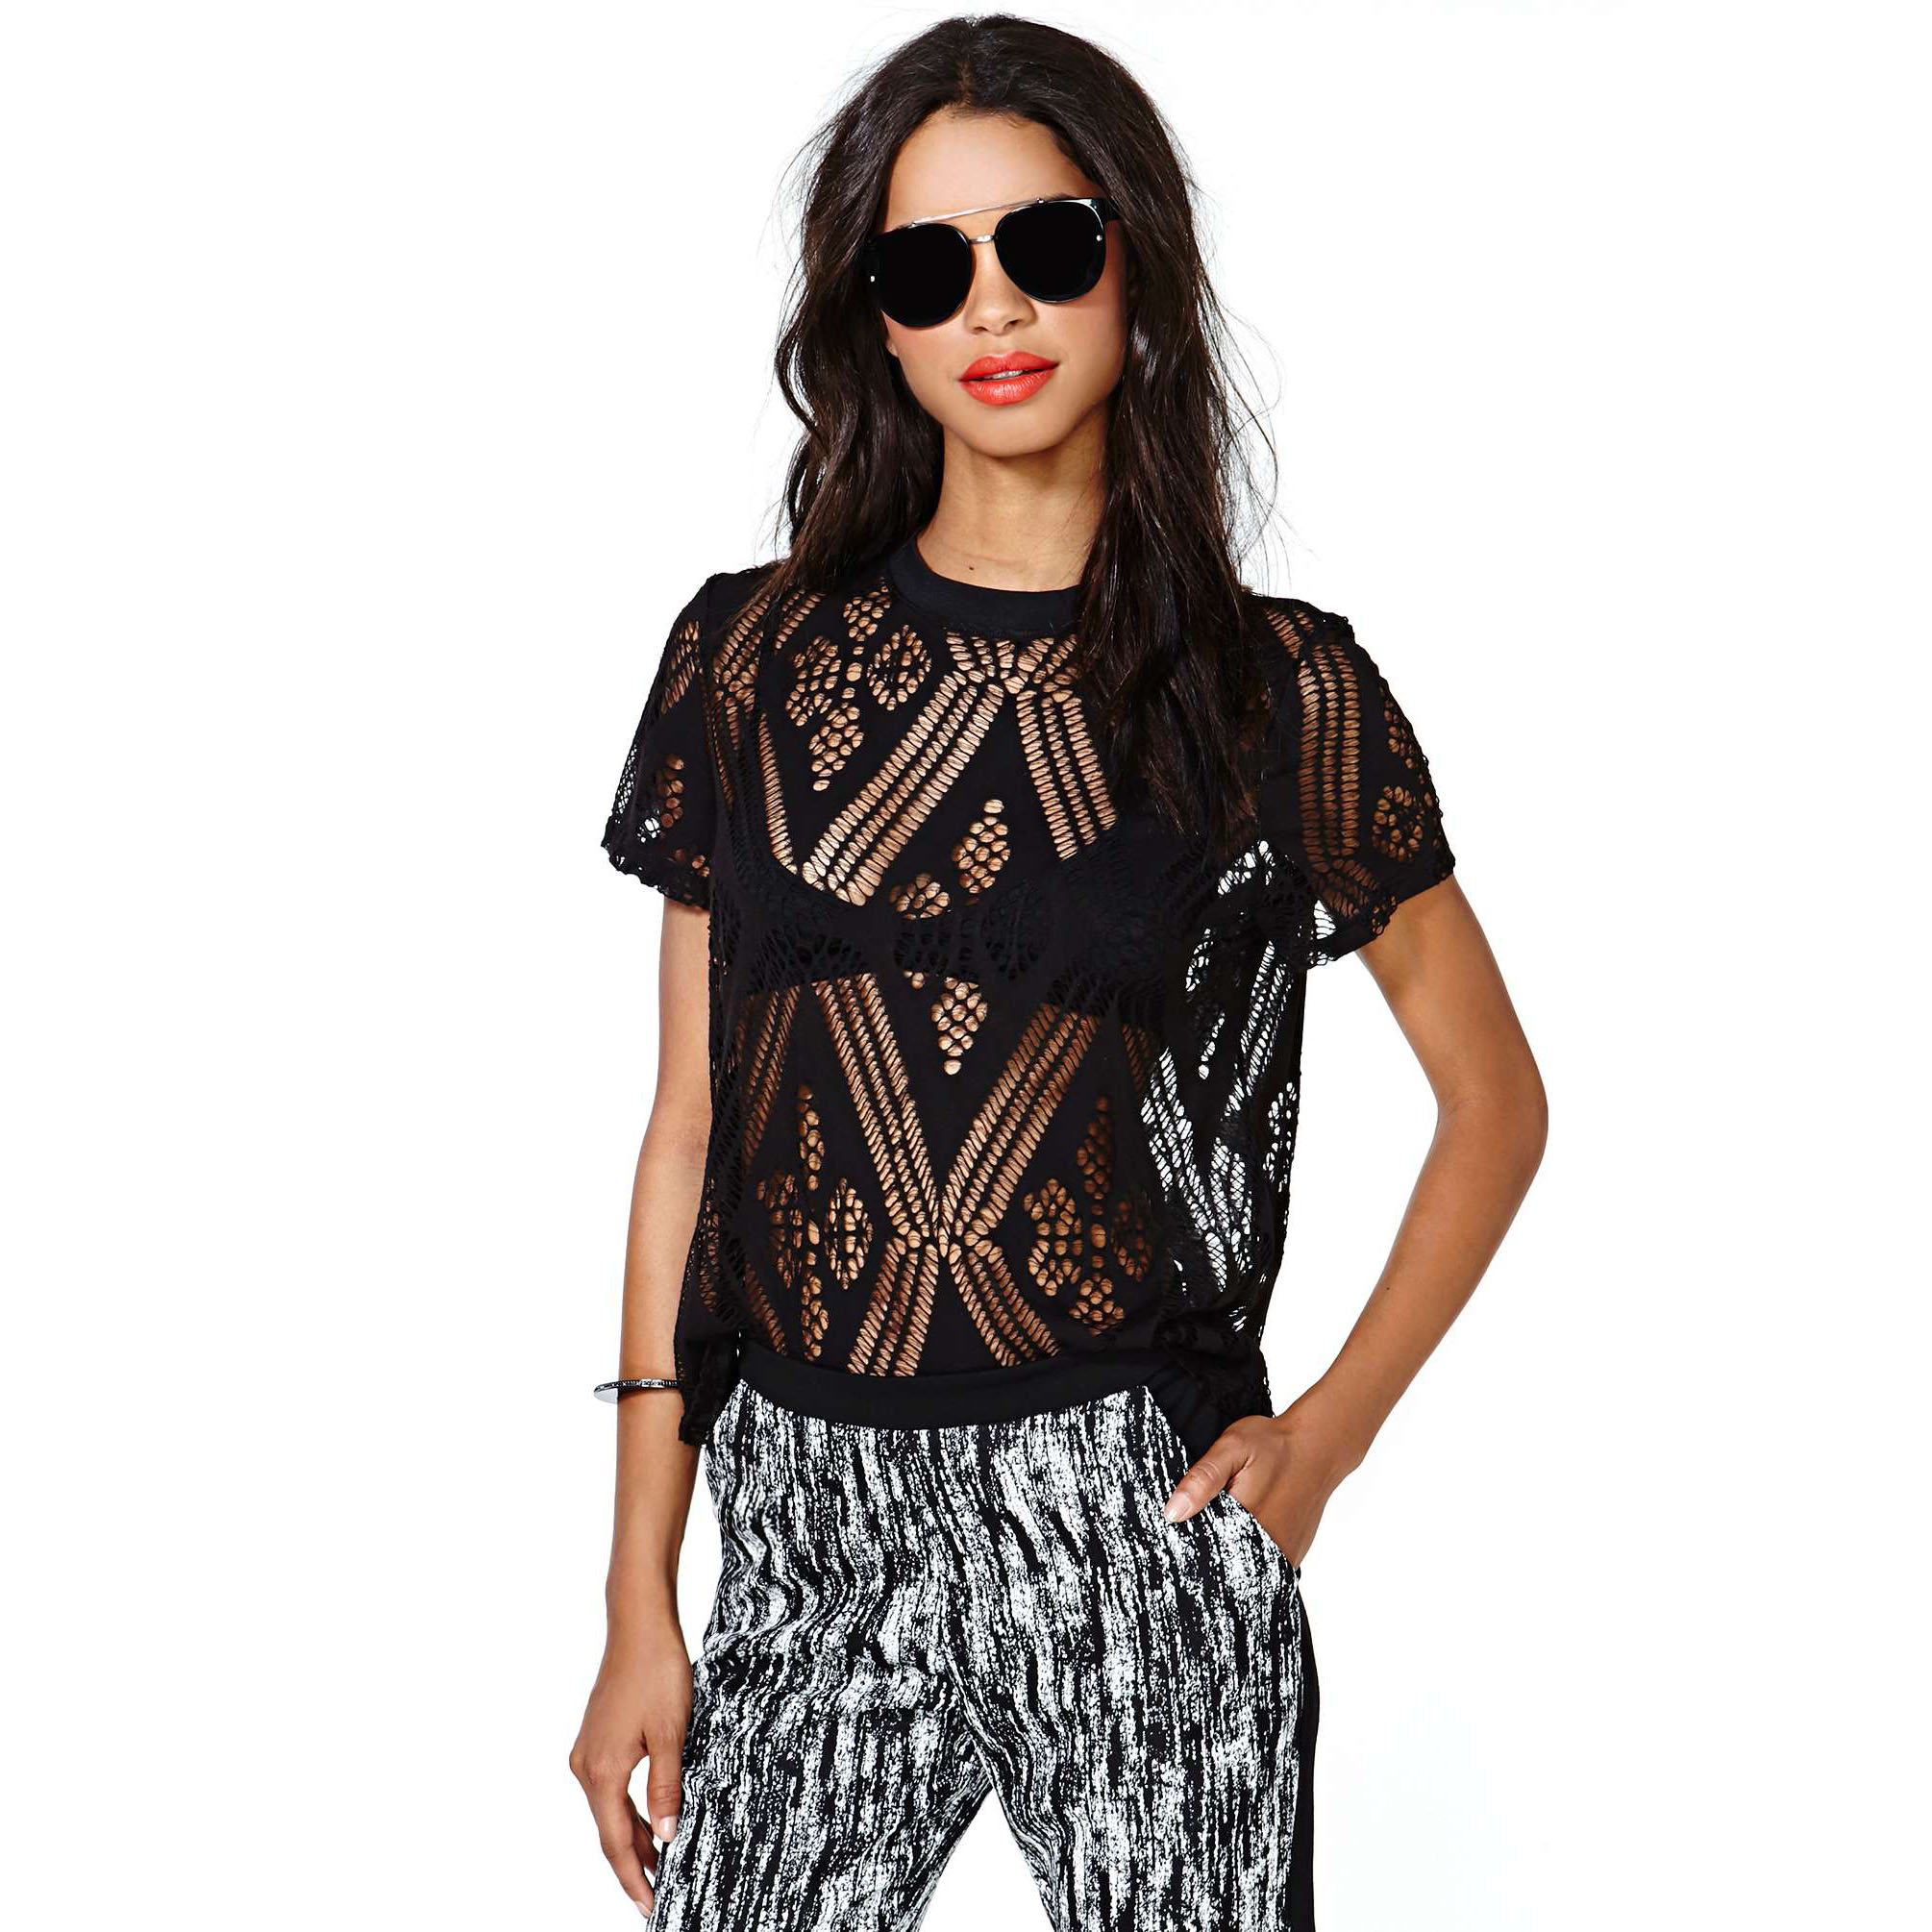 Perspectivity rhombus lace cutout <font><b>short-sleeve</b></font> o-neck <font><b>rib</b></font> <font><b>knitting</b></font> female t-shirt collar haoduoyi